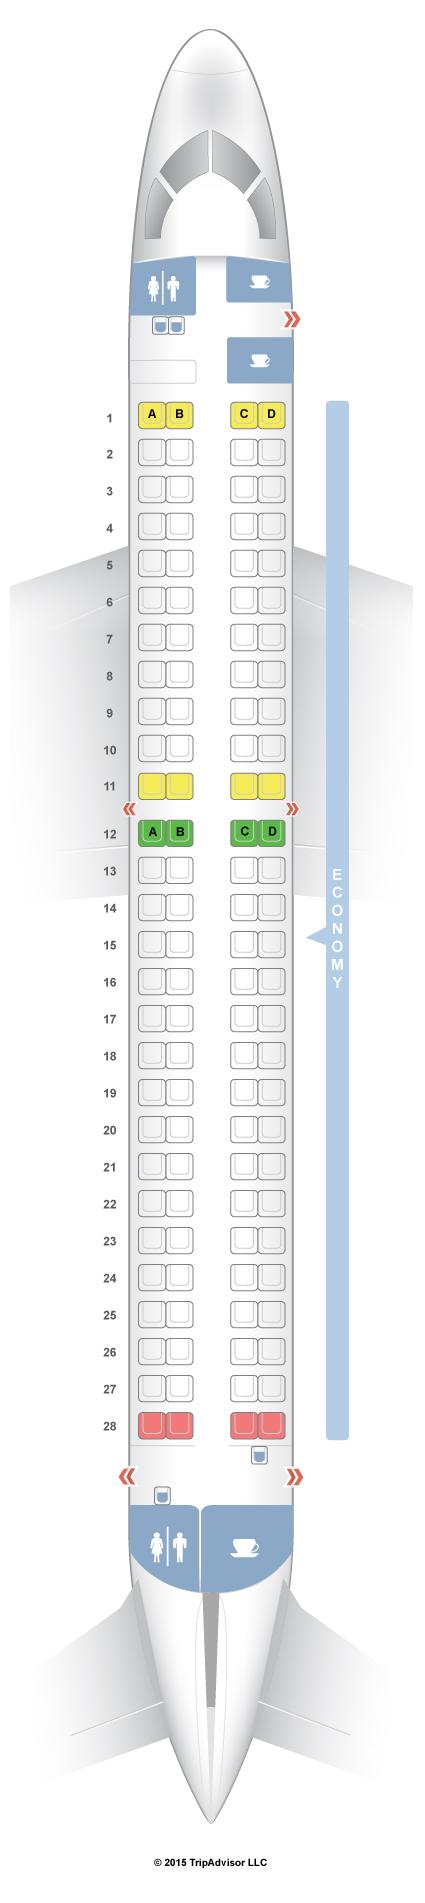 Seatguru Seat Map Lot Polish Airlines Embraer Erj 195 E95